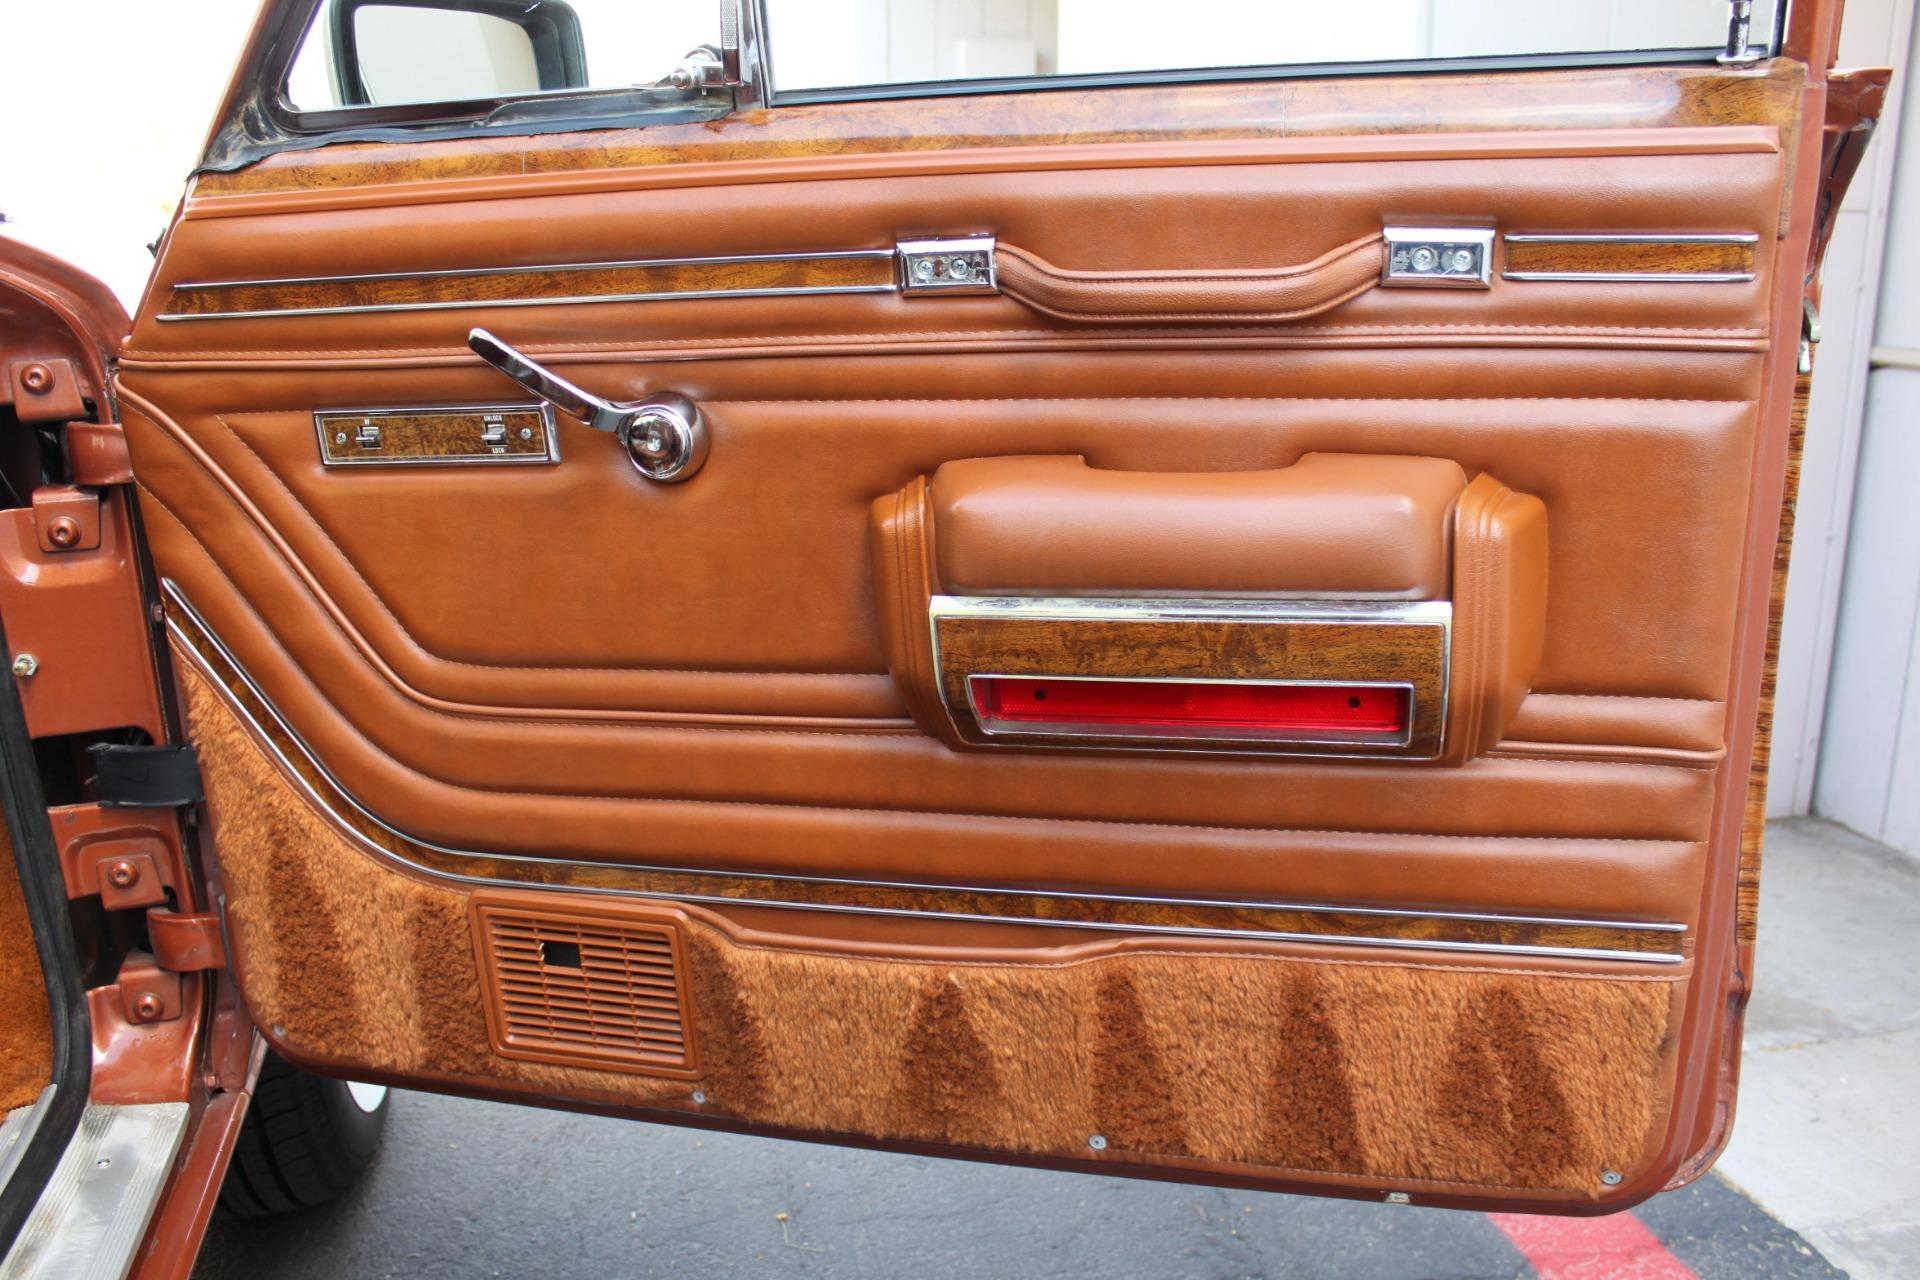 Used-1982-Jeep-Wagoneer-Limited-4WD-BMW